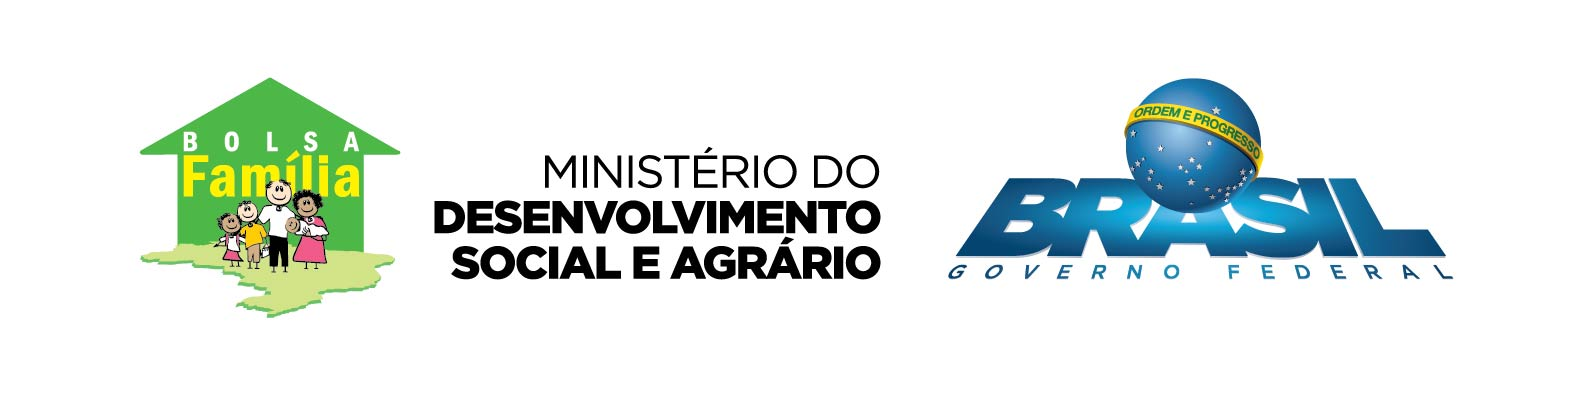 Beneficiários Programa Bolsa Família - ABRIL 2018